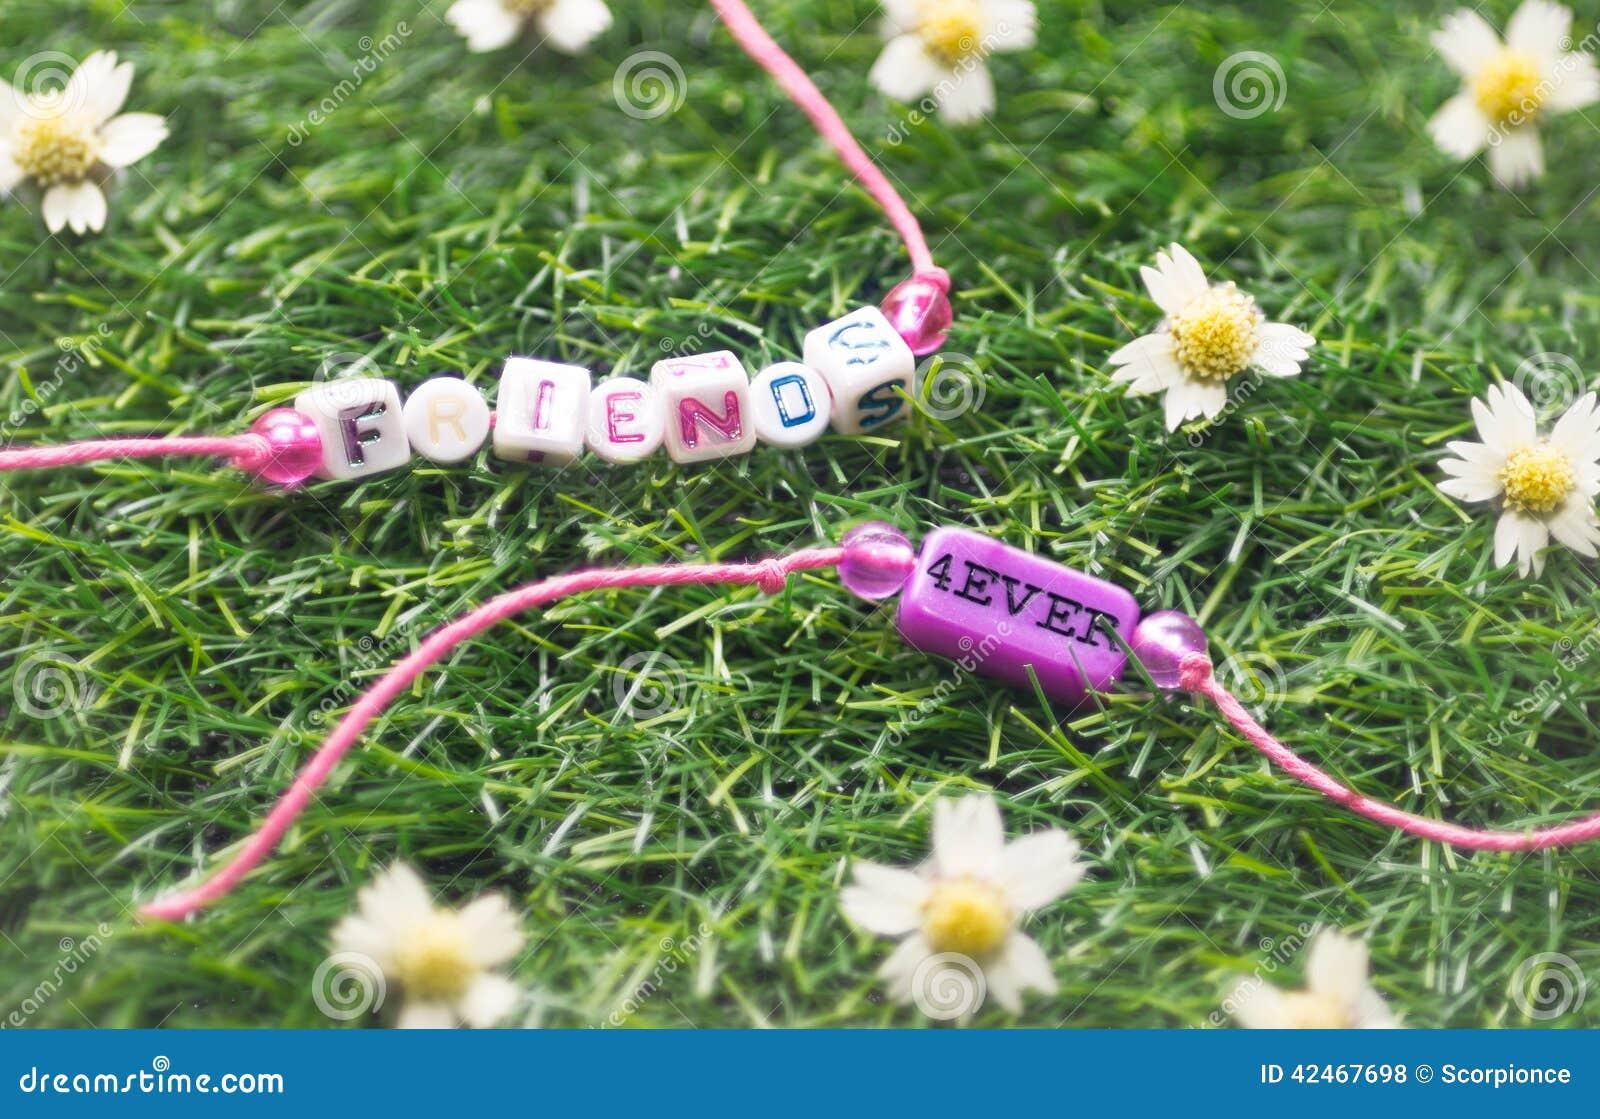 Armband der Freundschaft zwei auf Gras